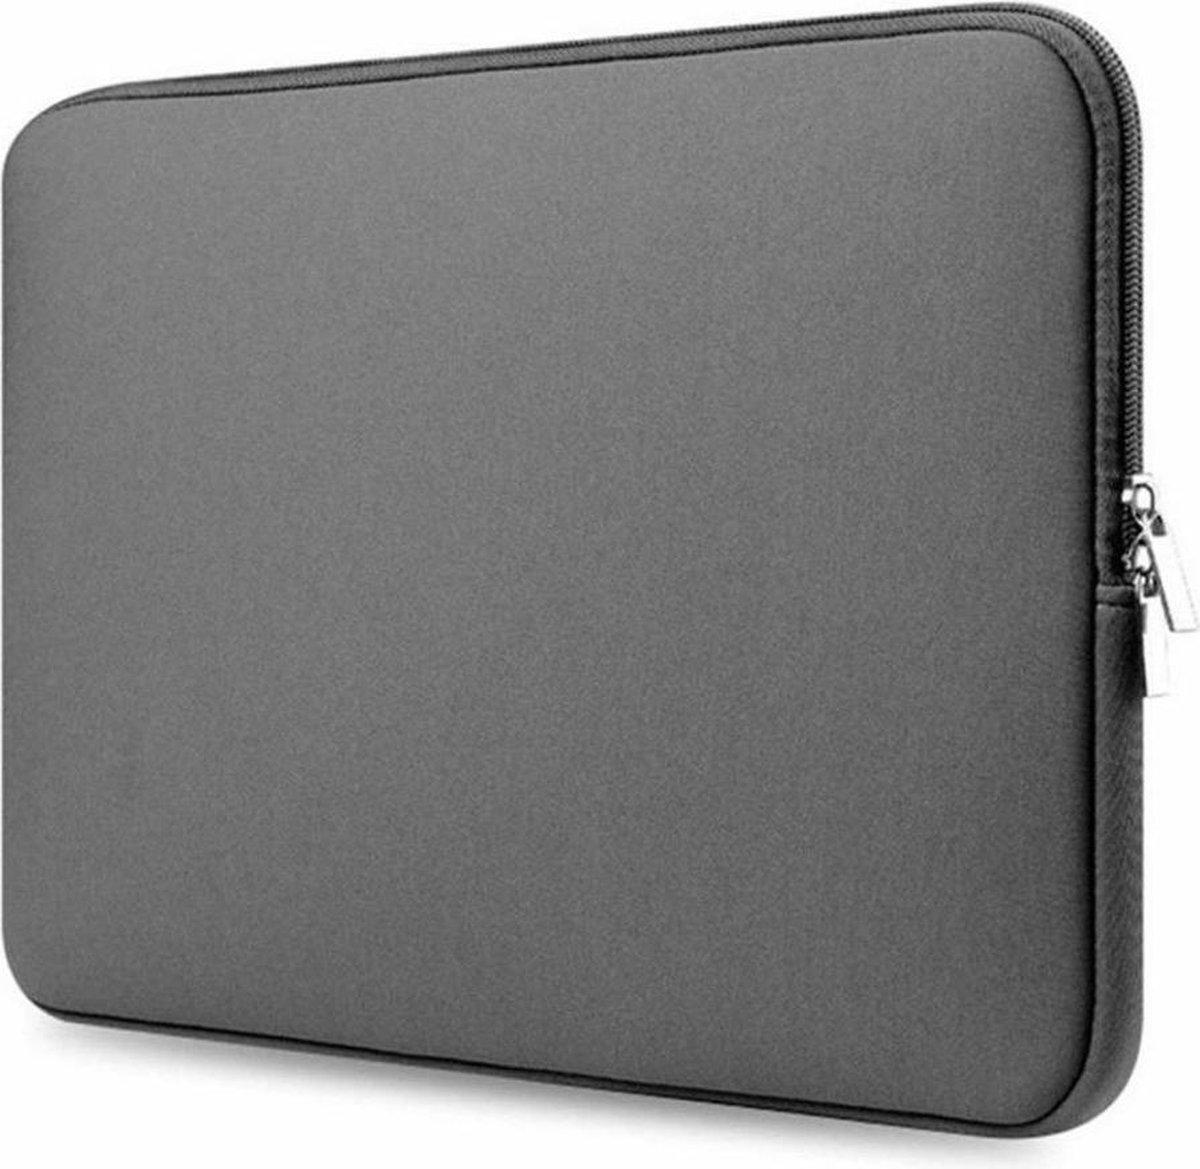 Apple MacBook Pro 13.3 inch (2020) hoes - Laptop sleeve - 13.3 inch - Grijs